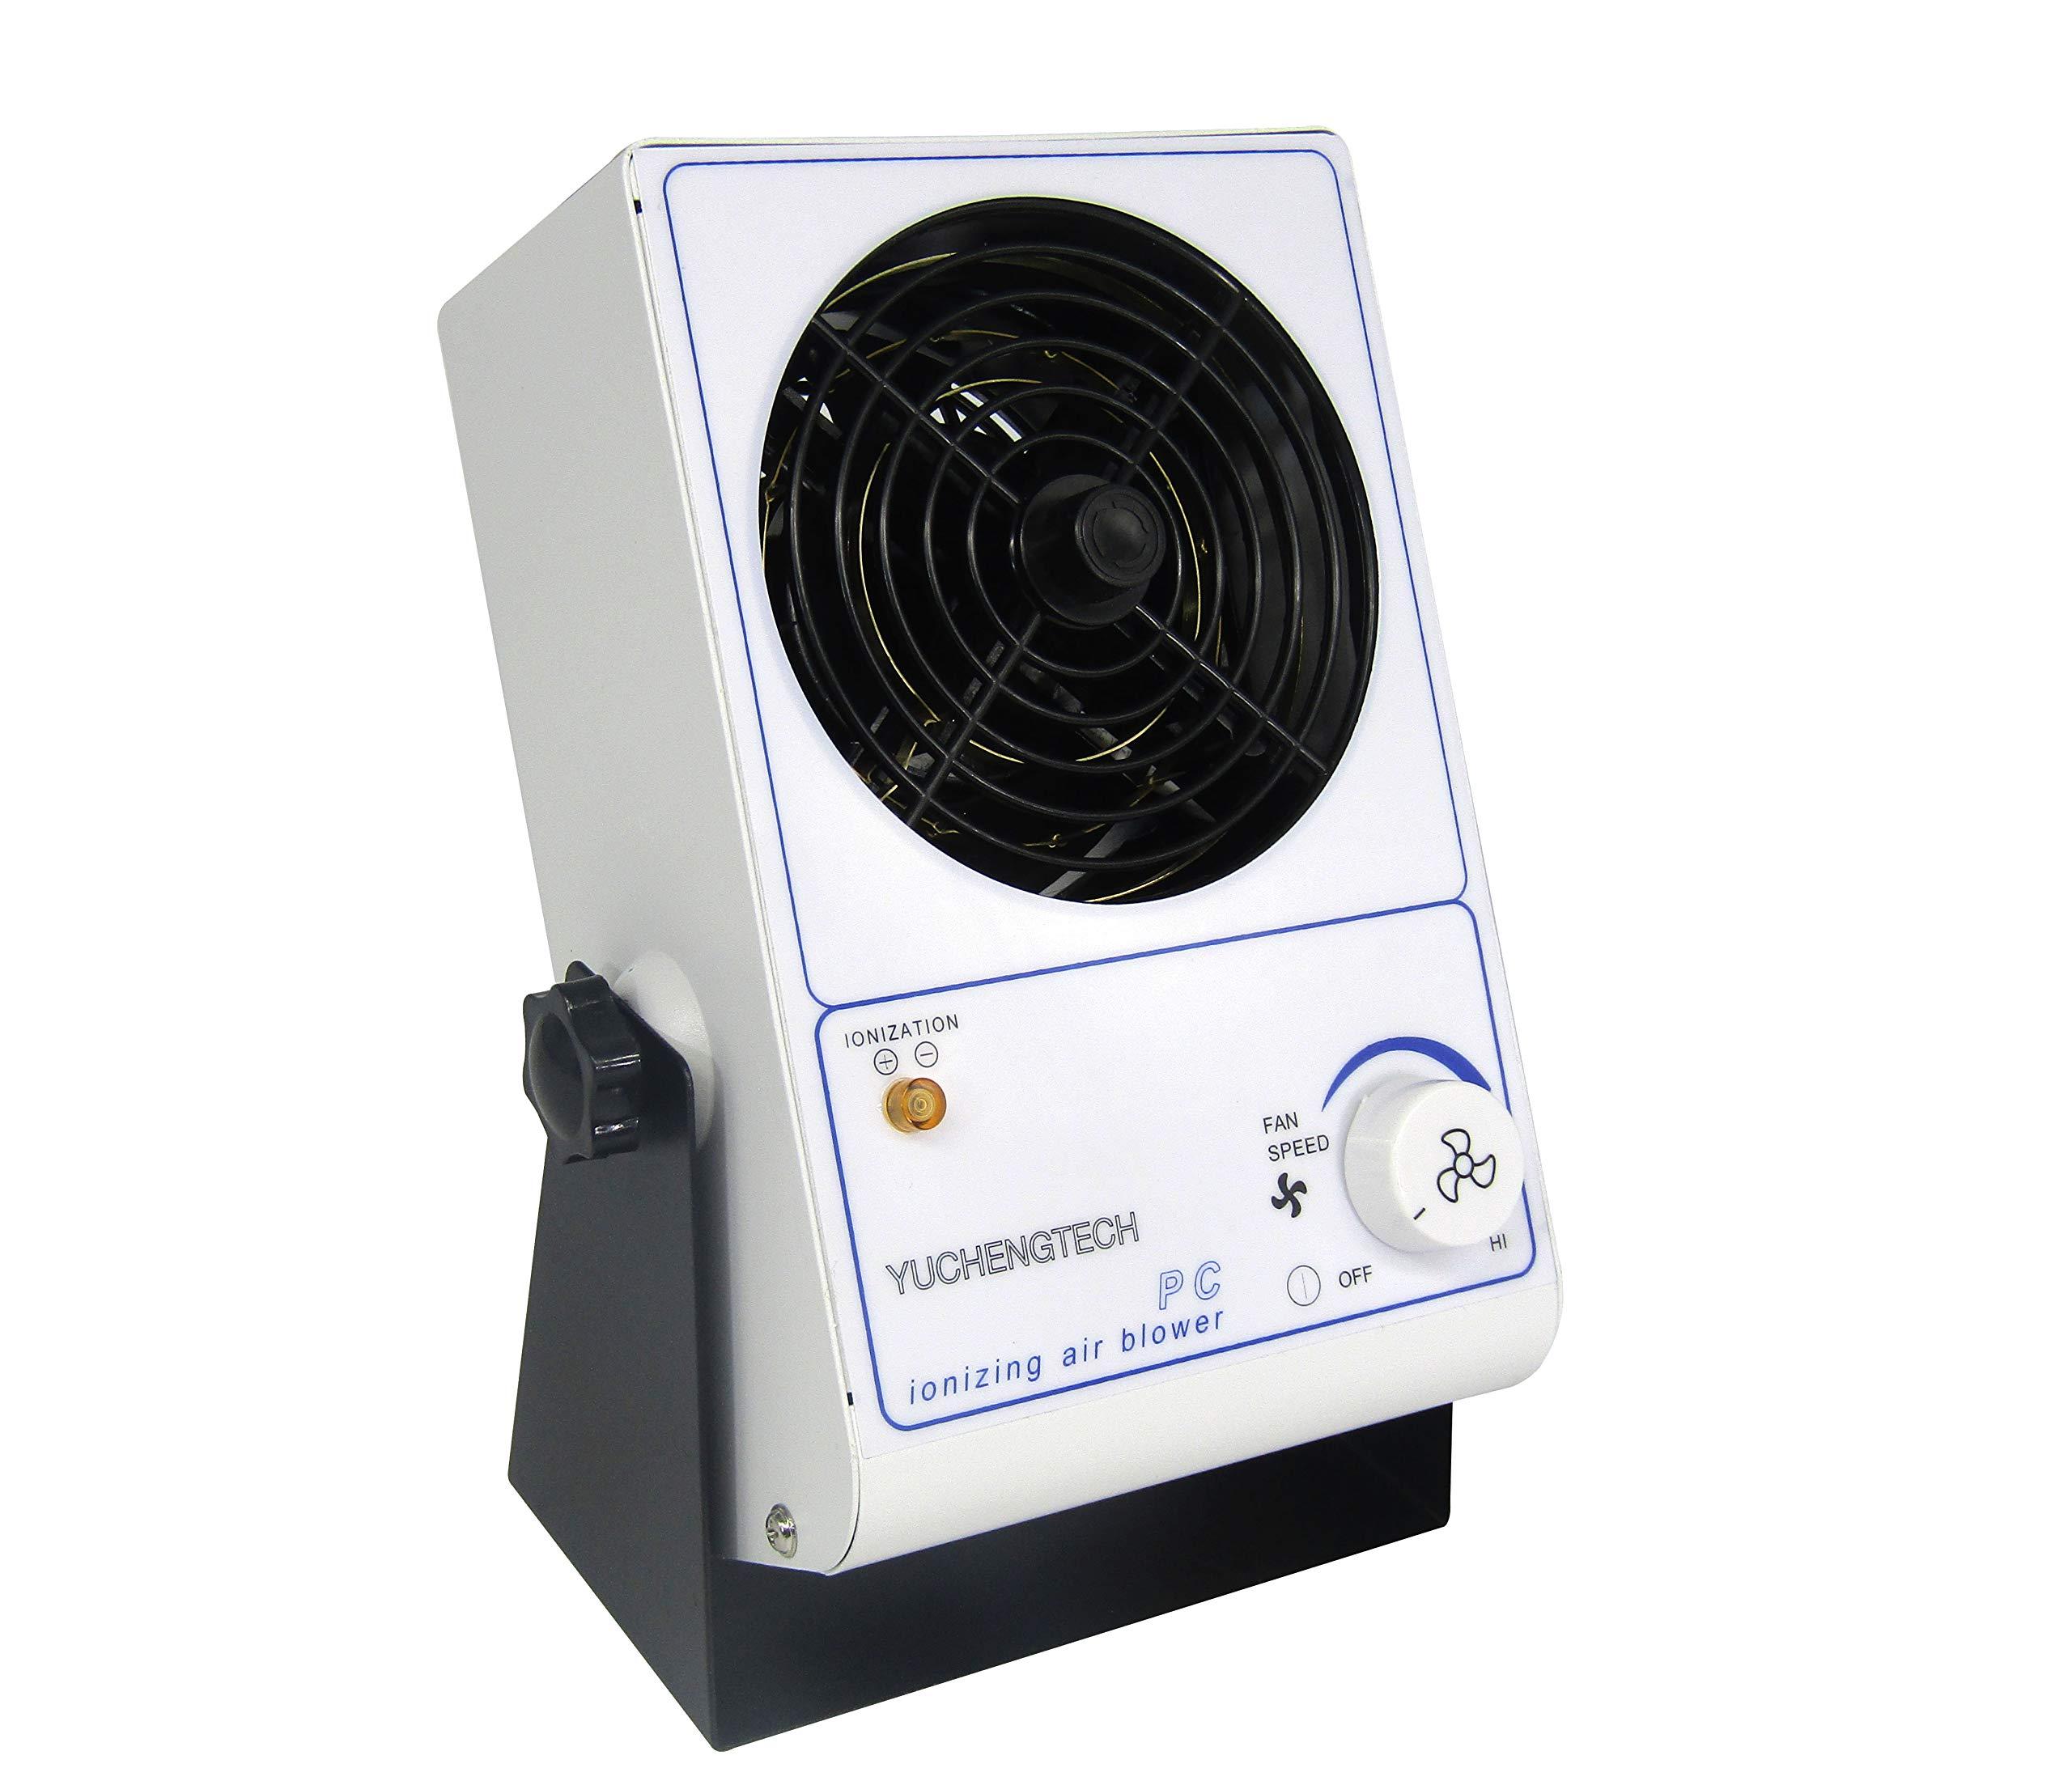 YUCHENGTECH Ionizing Air Blower ESD Fan Electro Discharge Static Eliminator DC Anti-Static Ionizer 110V - 120V